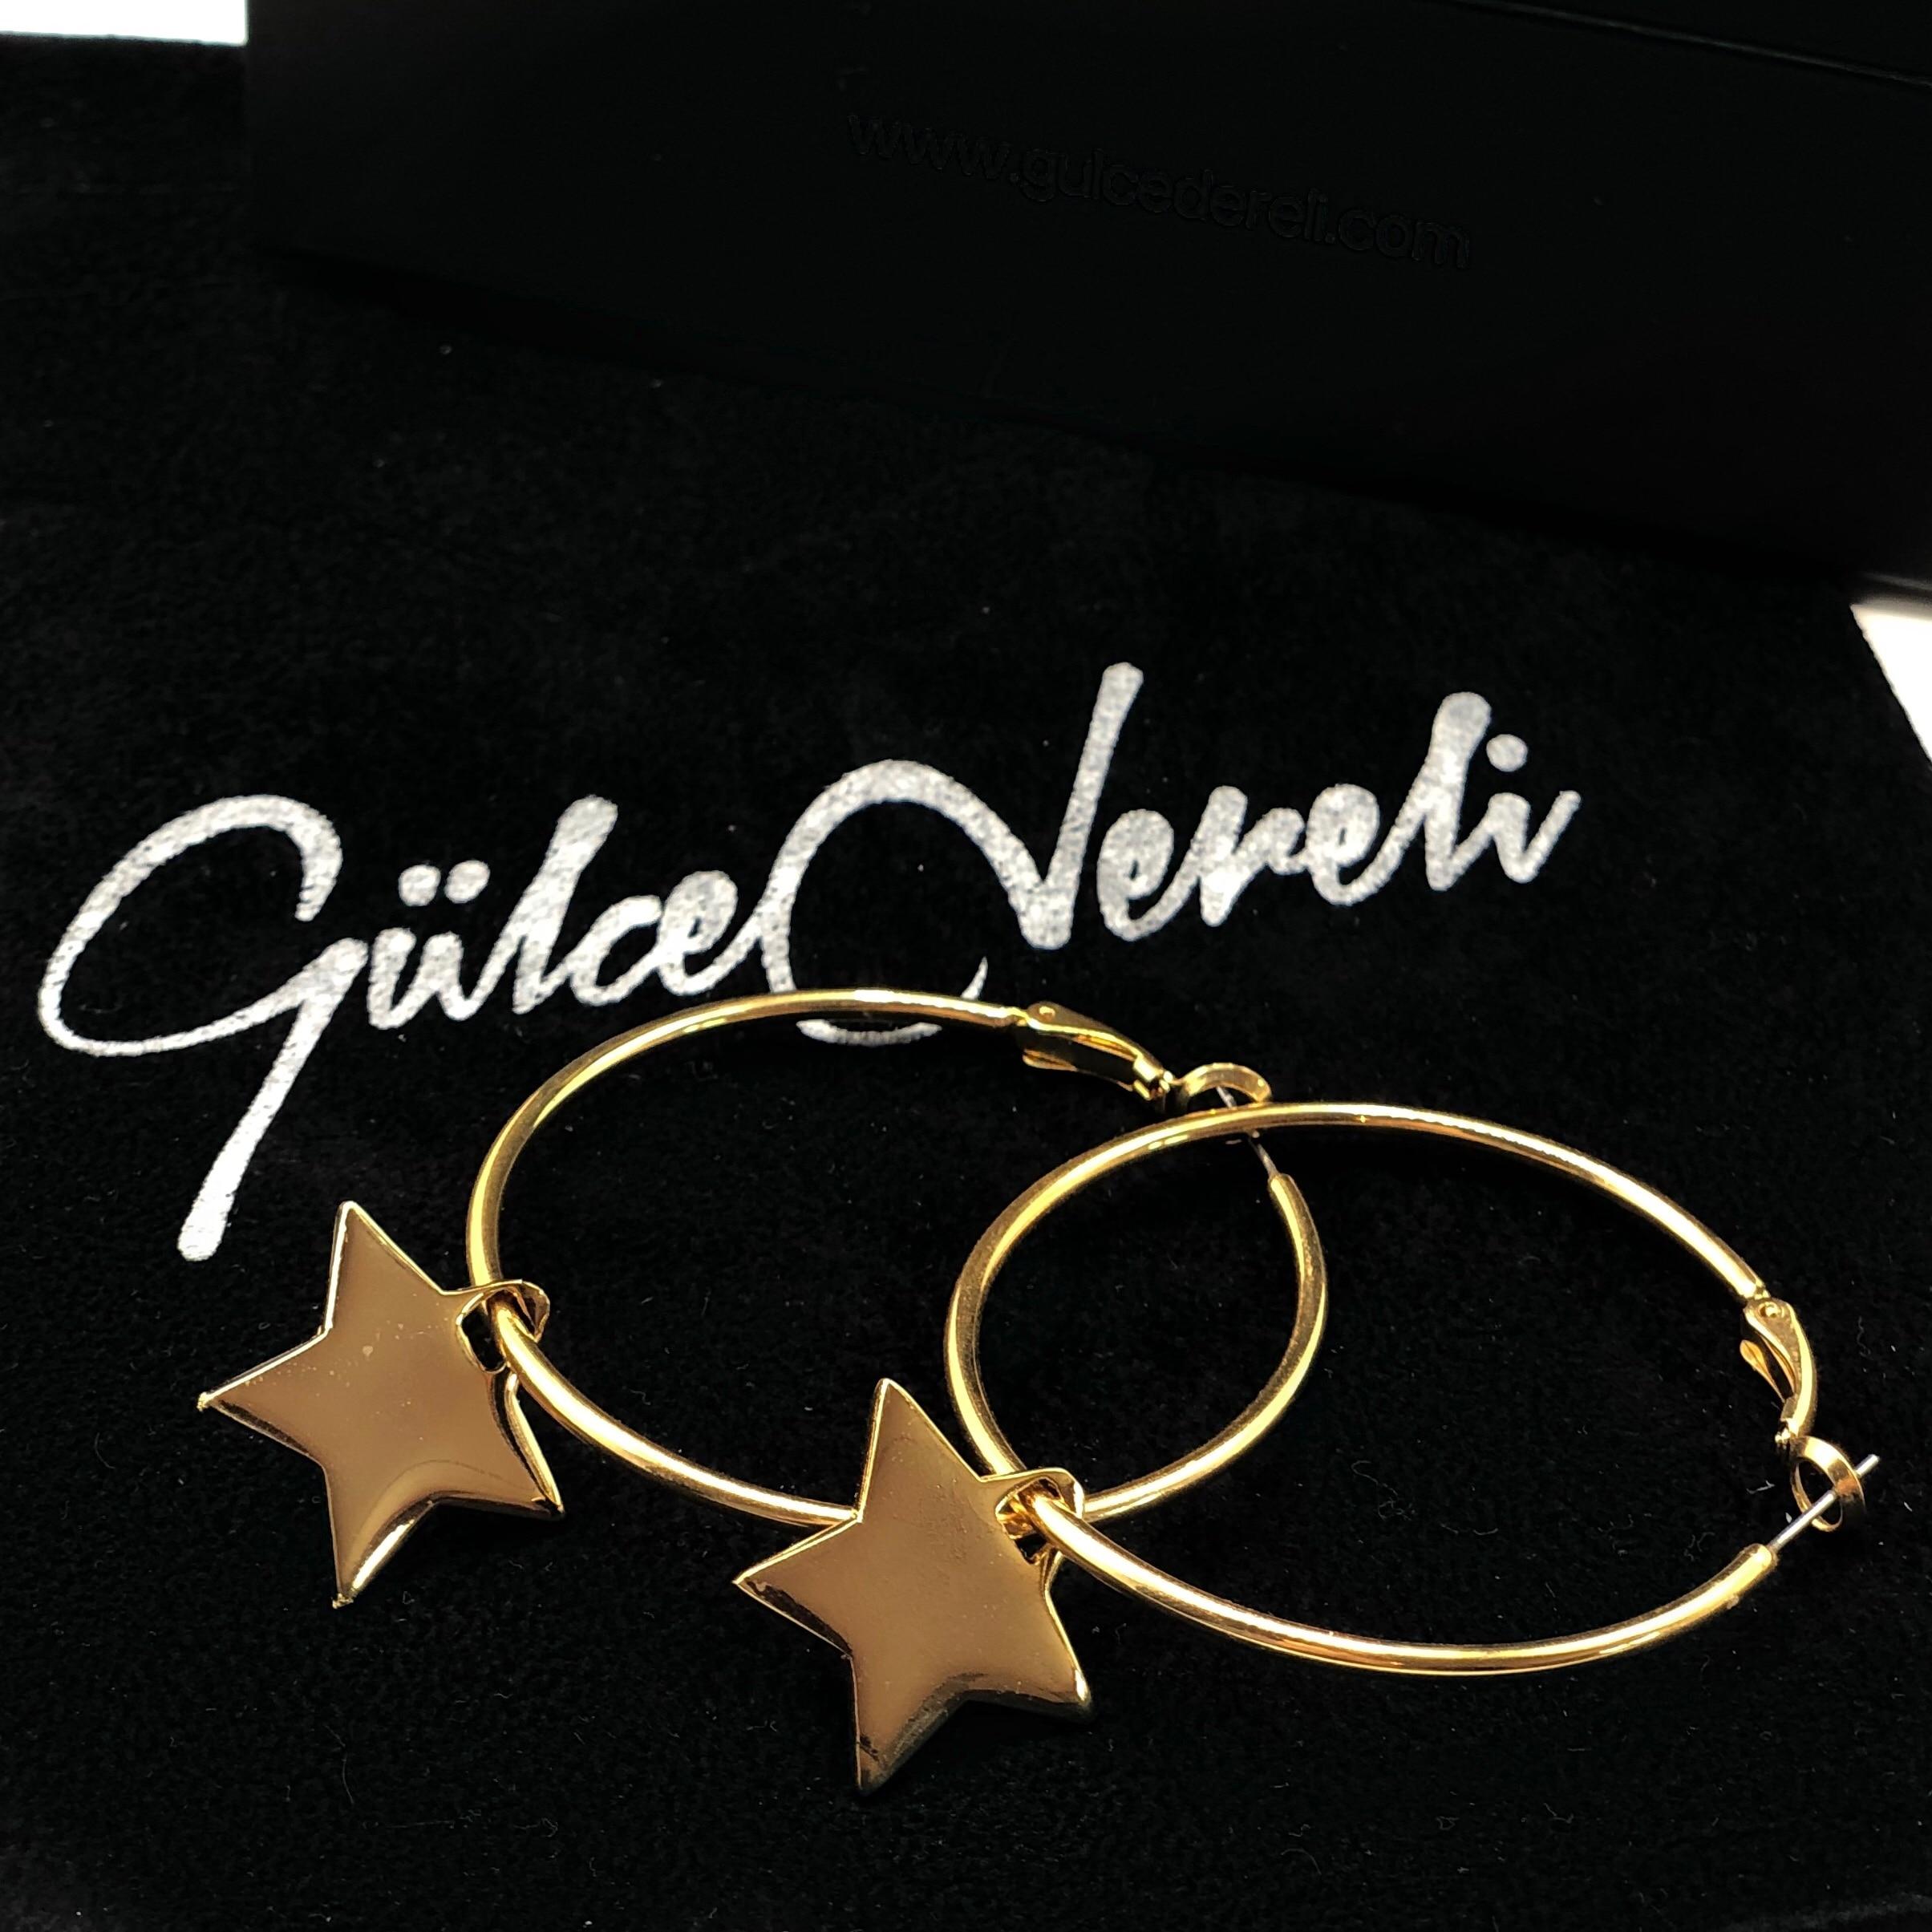 GULCE DERELI-أقراط على شكل نجمة ، أقراط دائرية ، أقراط ساحرة ، علبة هدايا ، مطلية بالذهب والفضة